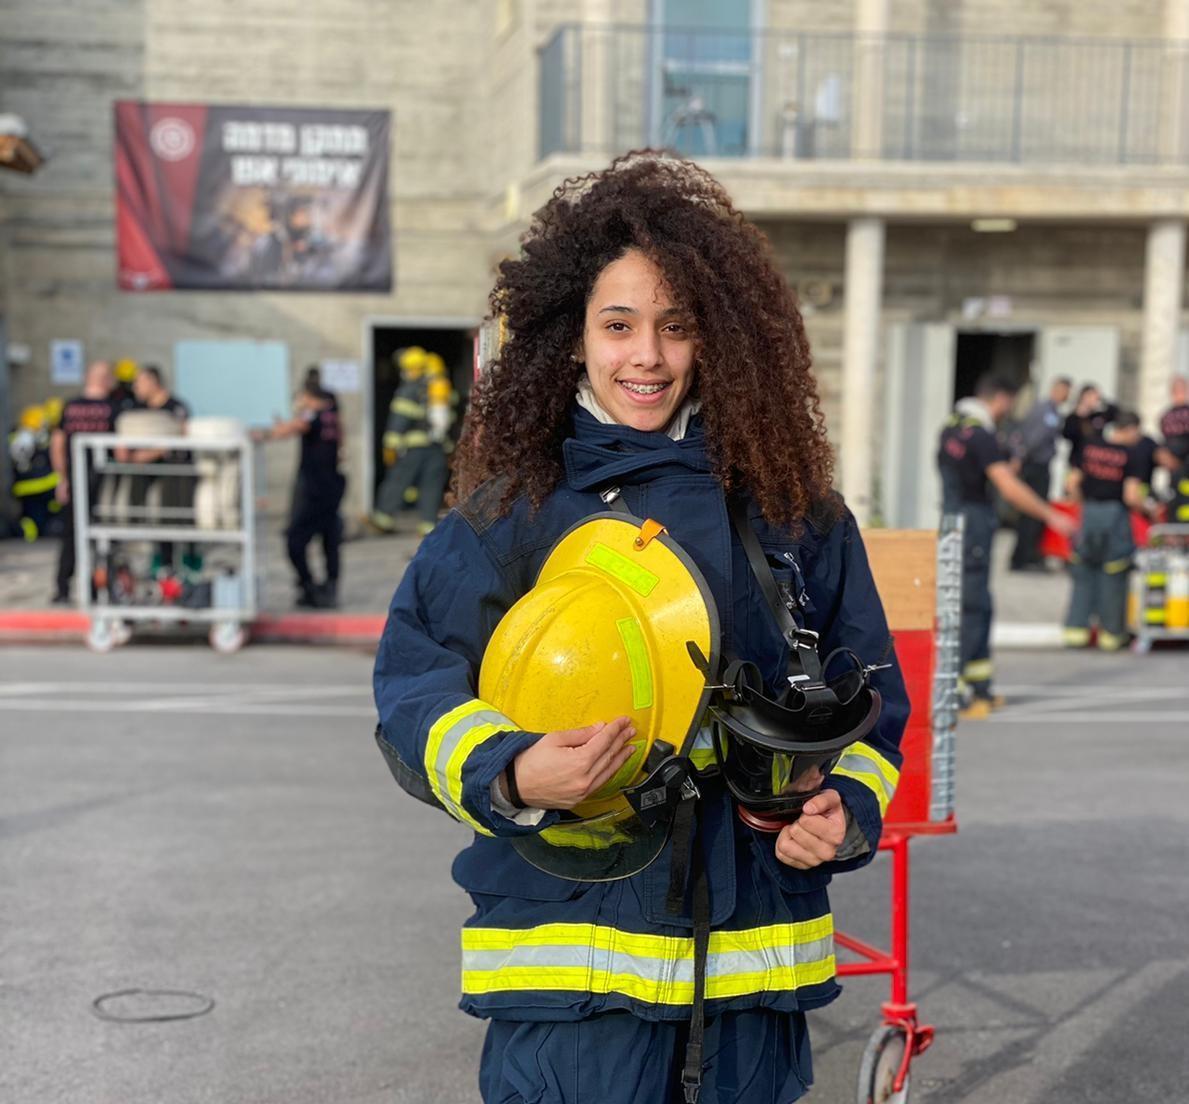 Volunteering as a Way of Life - Part 1 - SDG 16 - Social Impact Israel